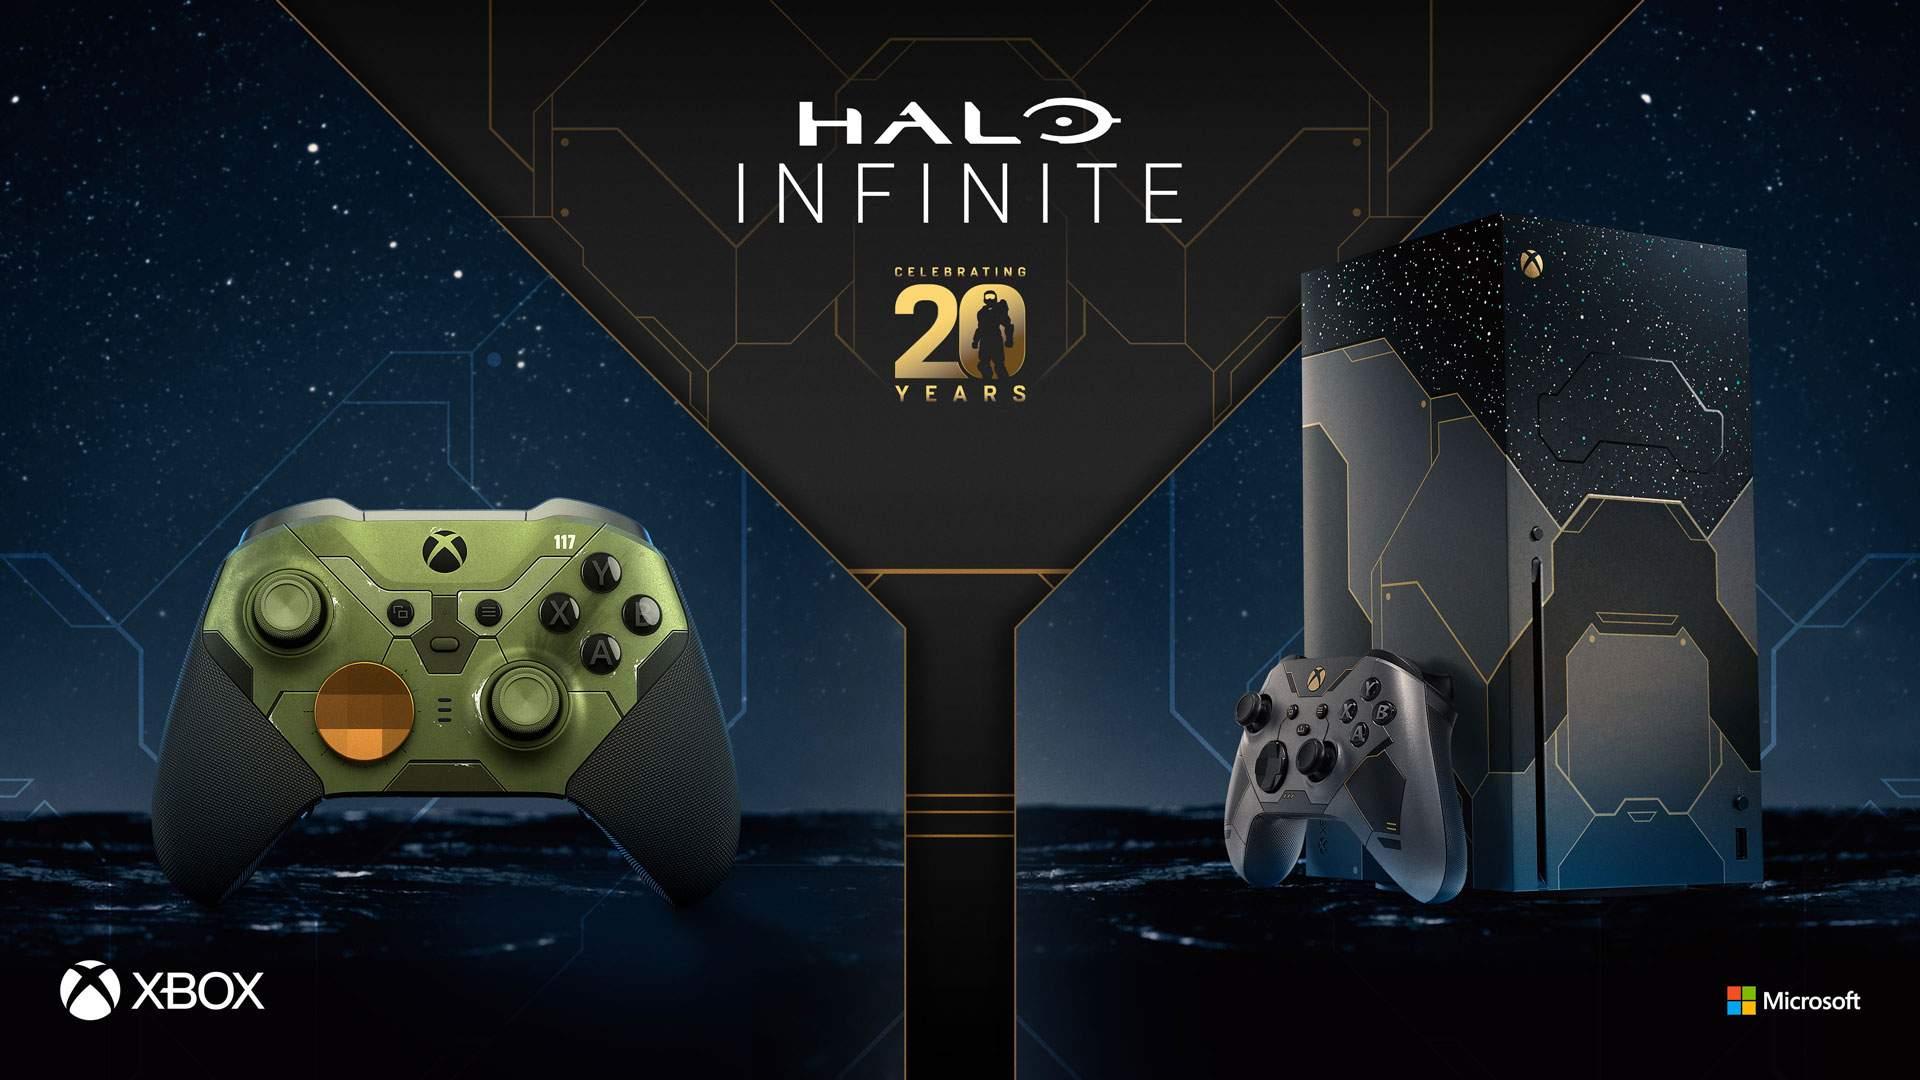 В эту пятницу в России стартуют предзаказы Xbox Series X Halo Infinite и Halo Infinite Elite Series 2